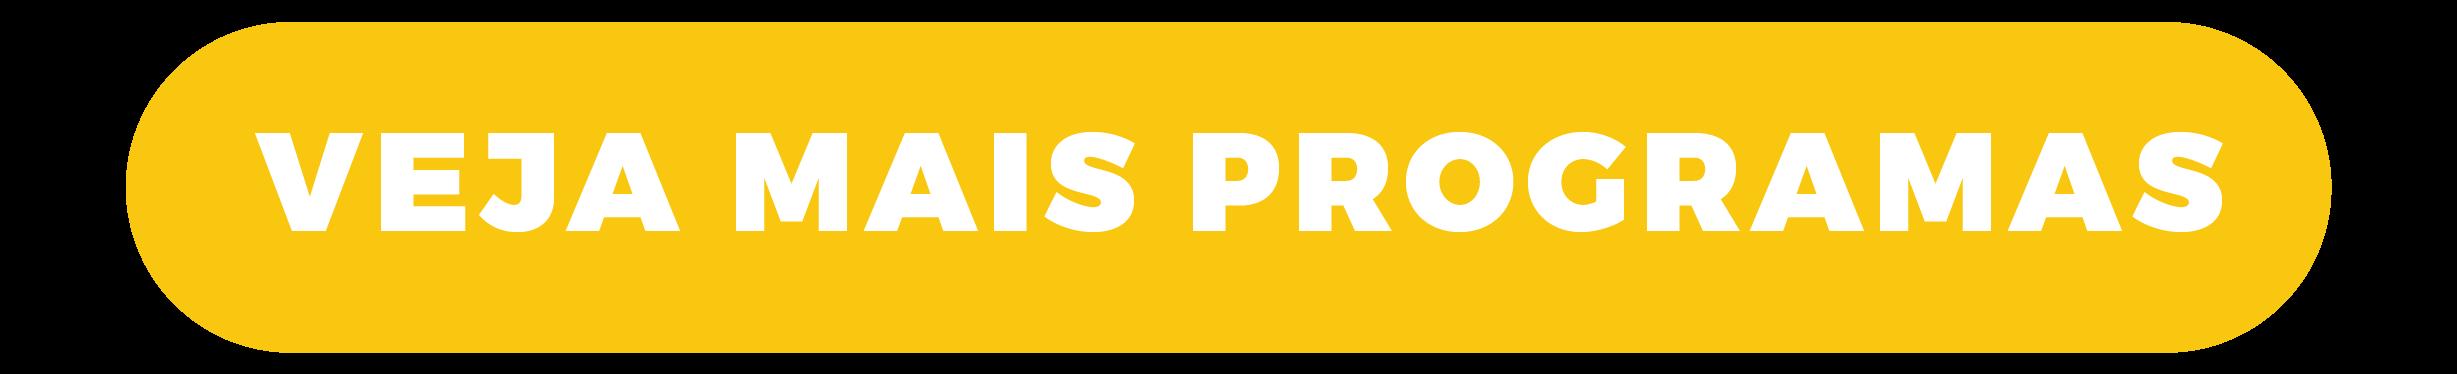 ProgramsButton_2